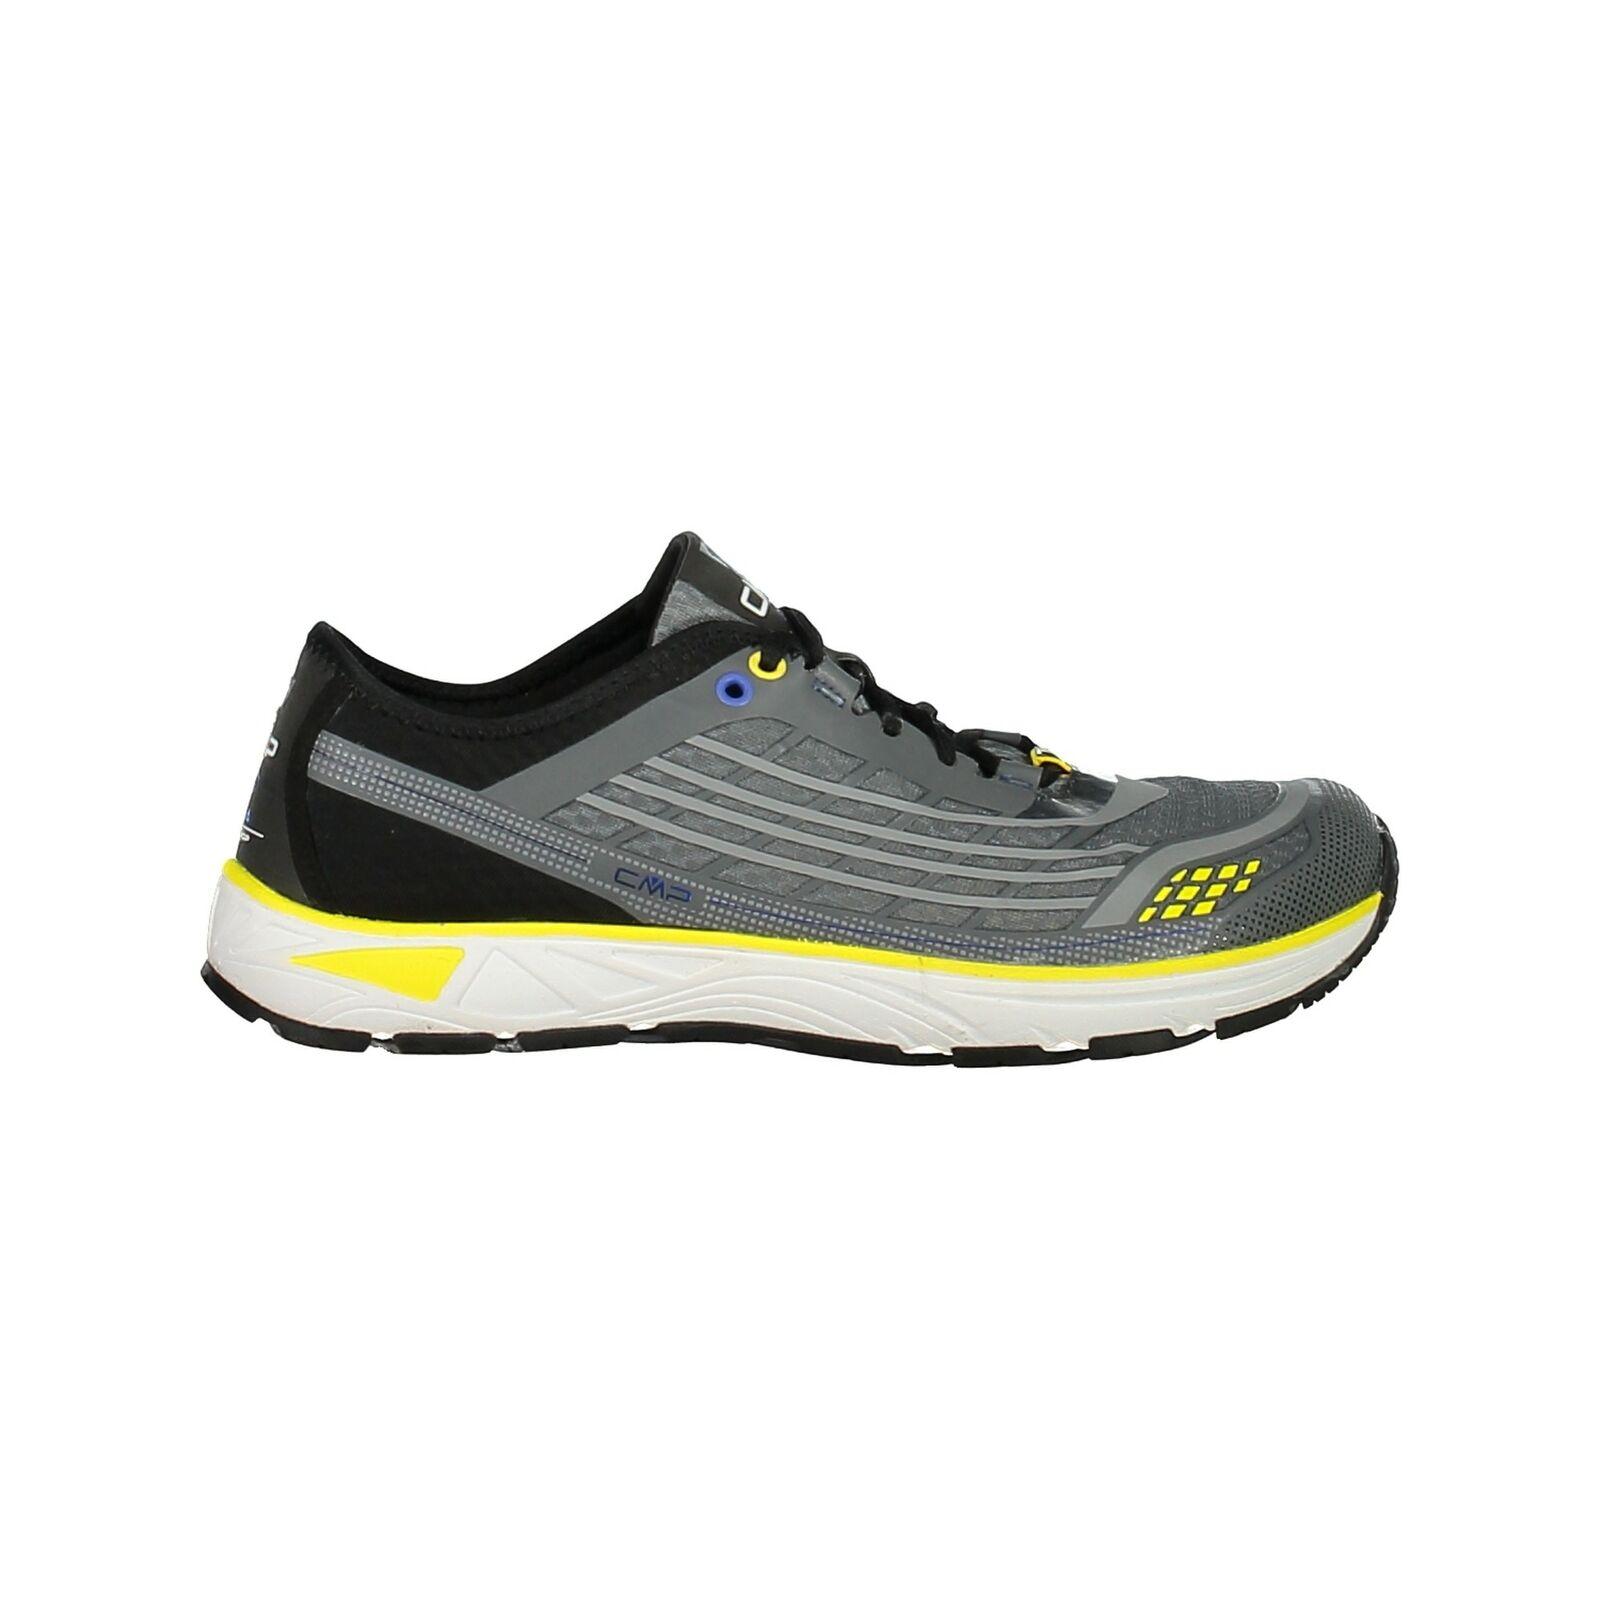 CMP Scarpe Da Corsa Scarpe Sportive libre running scarpe grigio leggermente tinta mesh